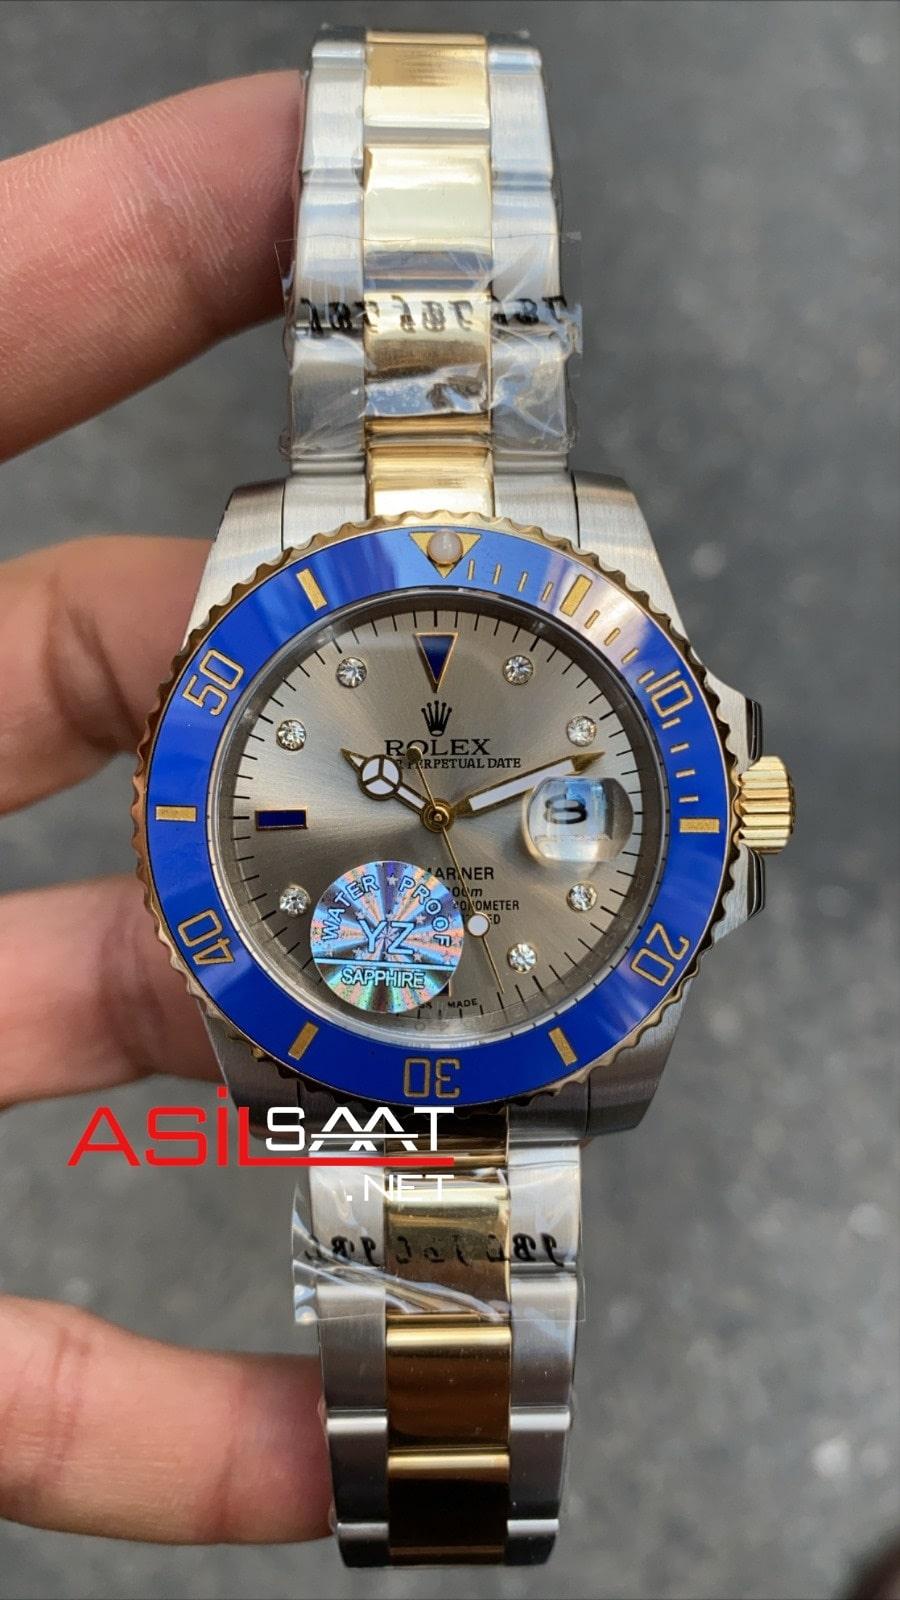 Rolex Oyster Perpetual Submariner Dial Diamond Two Tone Replika Saat ROLS009